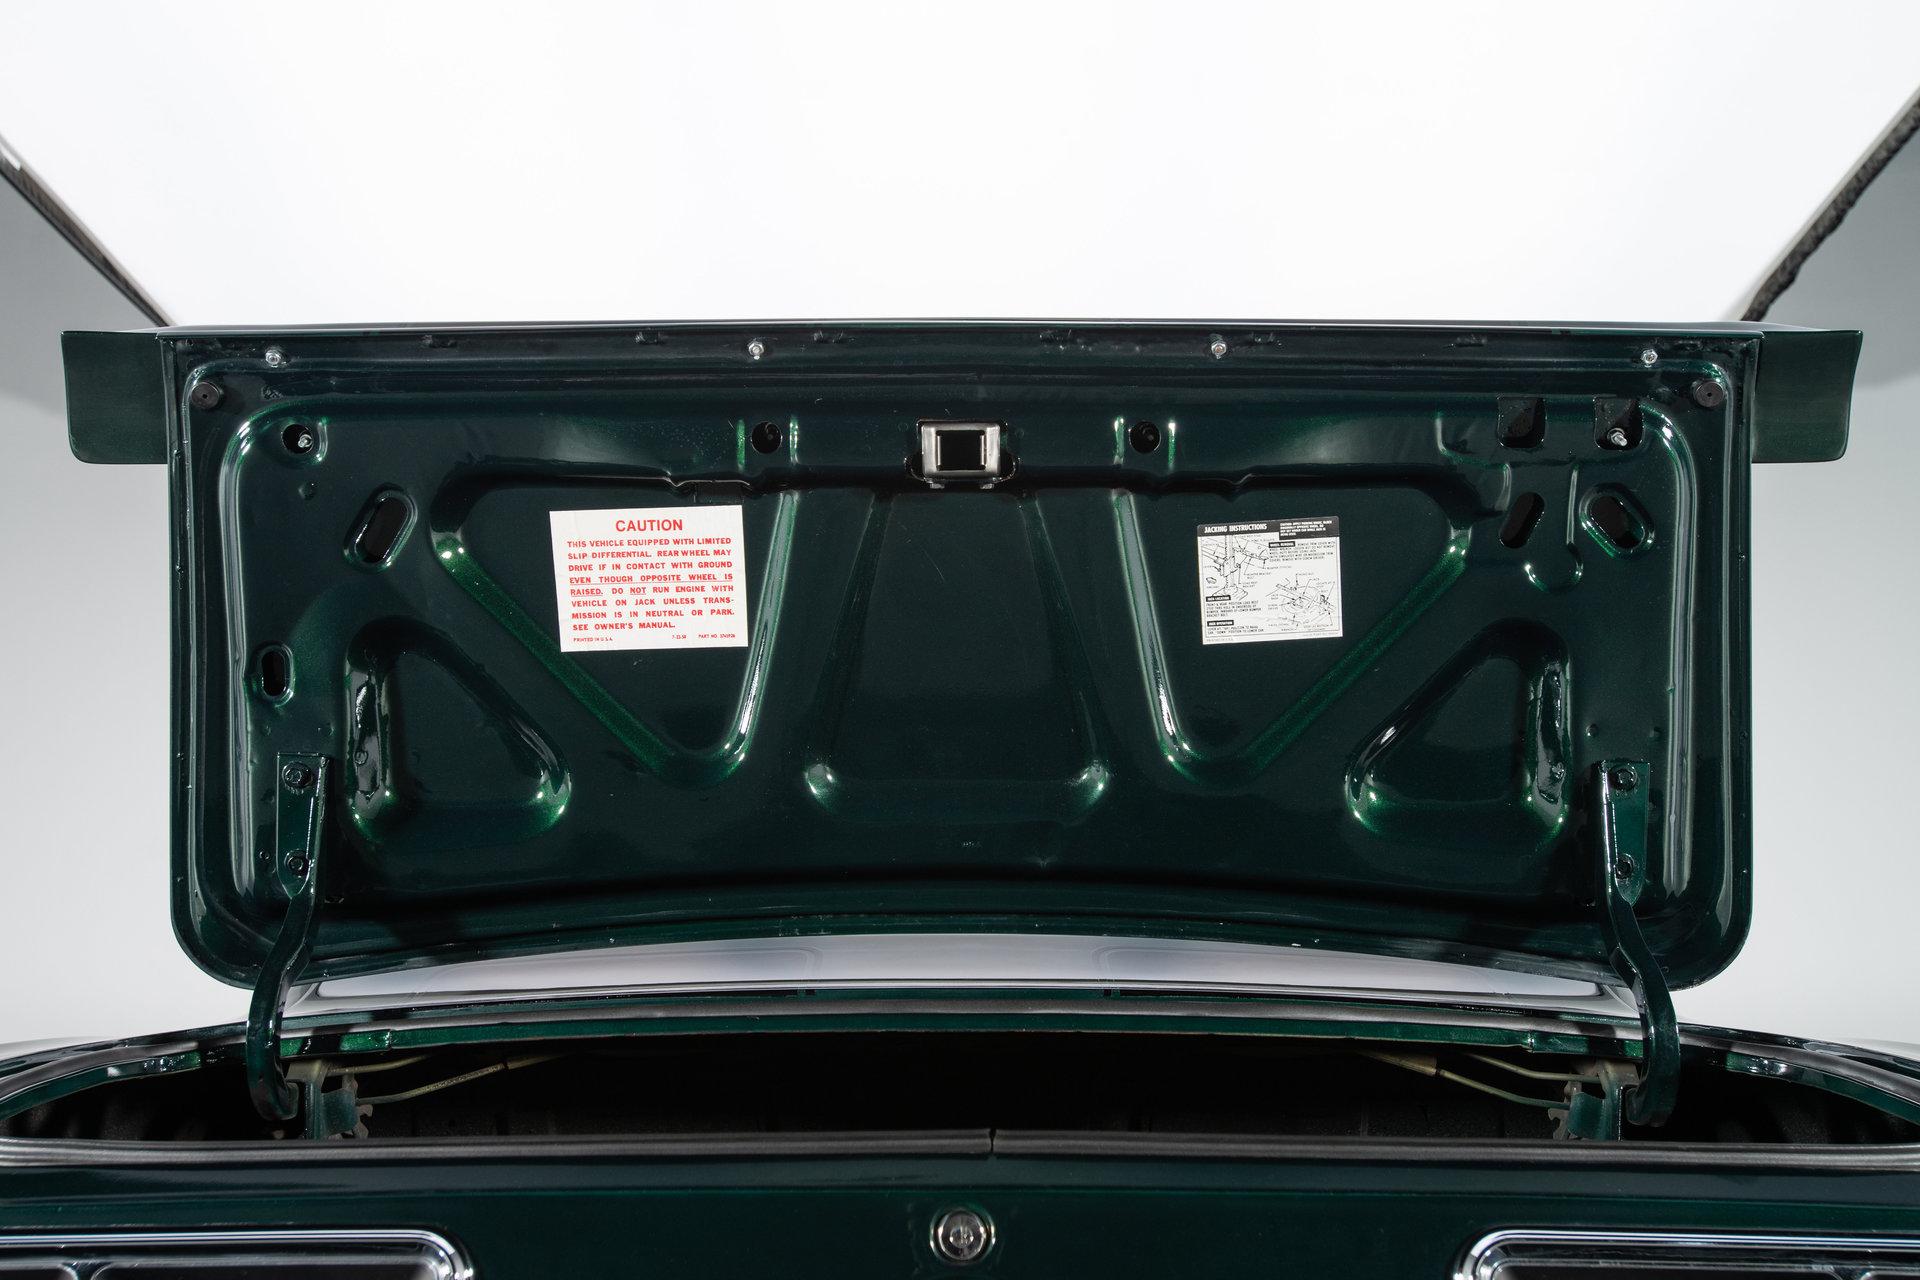 1968 Chevrolet Camaro Z 28 For Sale 106399 Mcg Tic Toc Tach Wiring Diagram